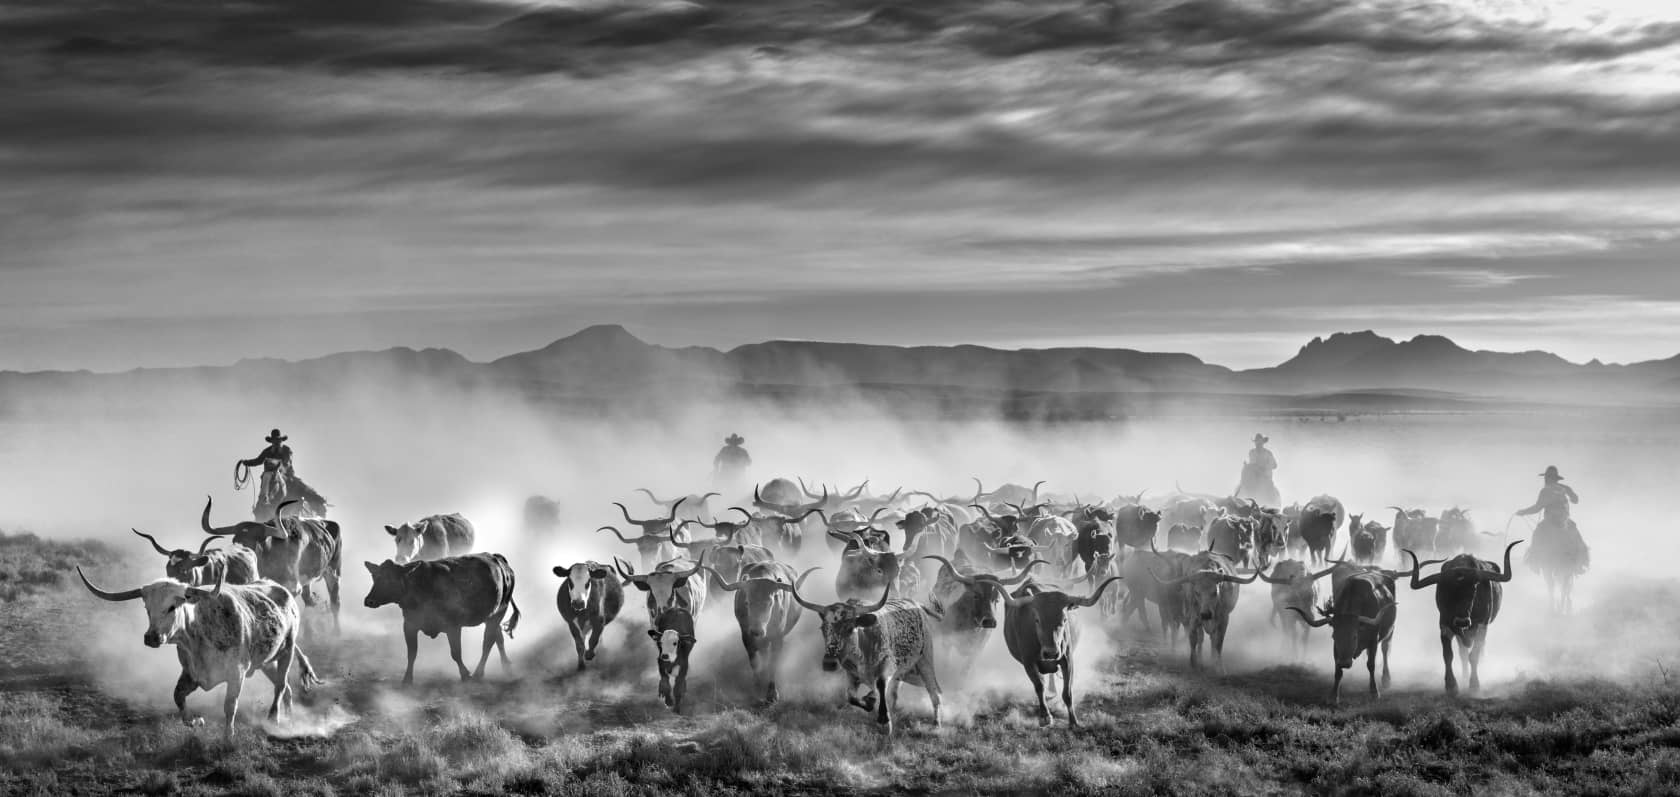 David Yarrow The Thundering Herd Archival Pigment Print